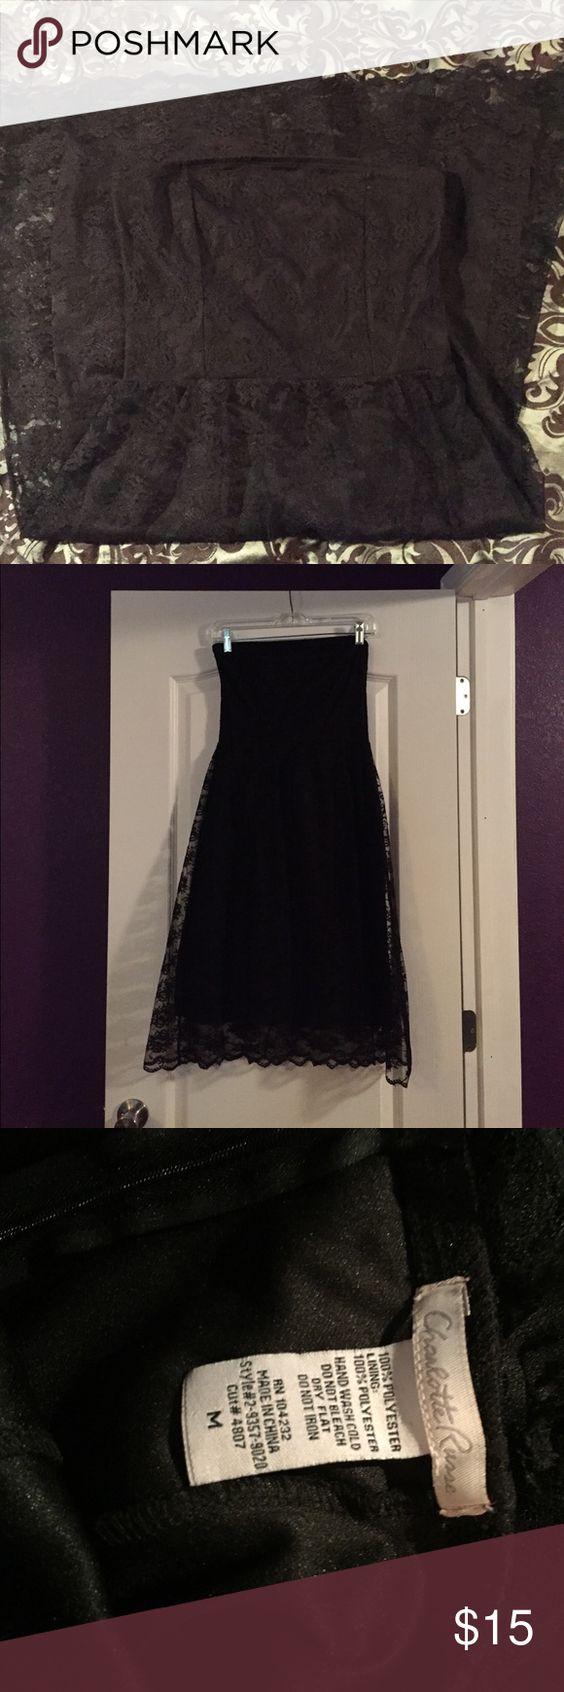 Charlotte Russe Dress • Medium Charlotte Russe Dress • Medium • Black Lace Strapless Dress • Charlotte Russe Dresses